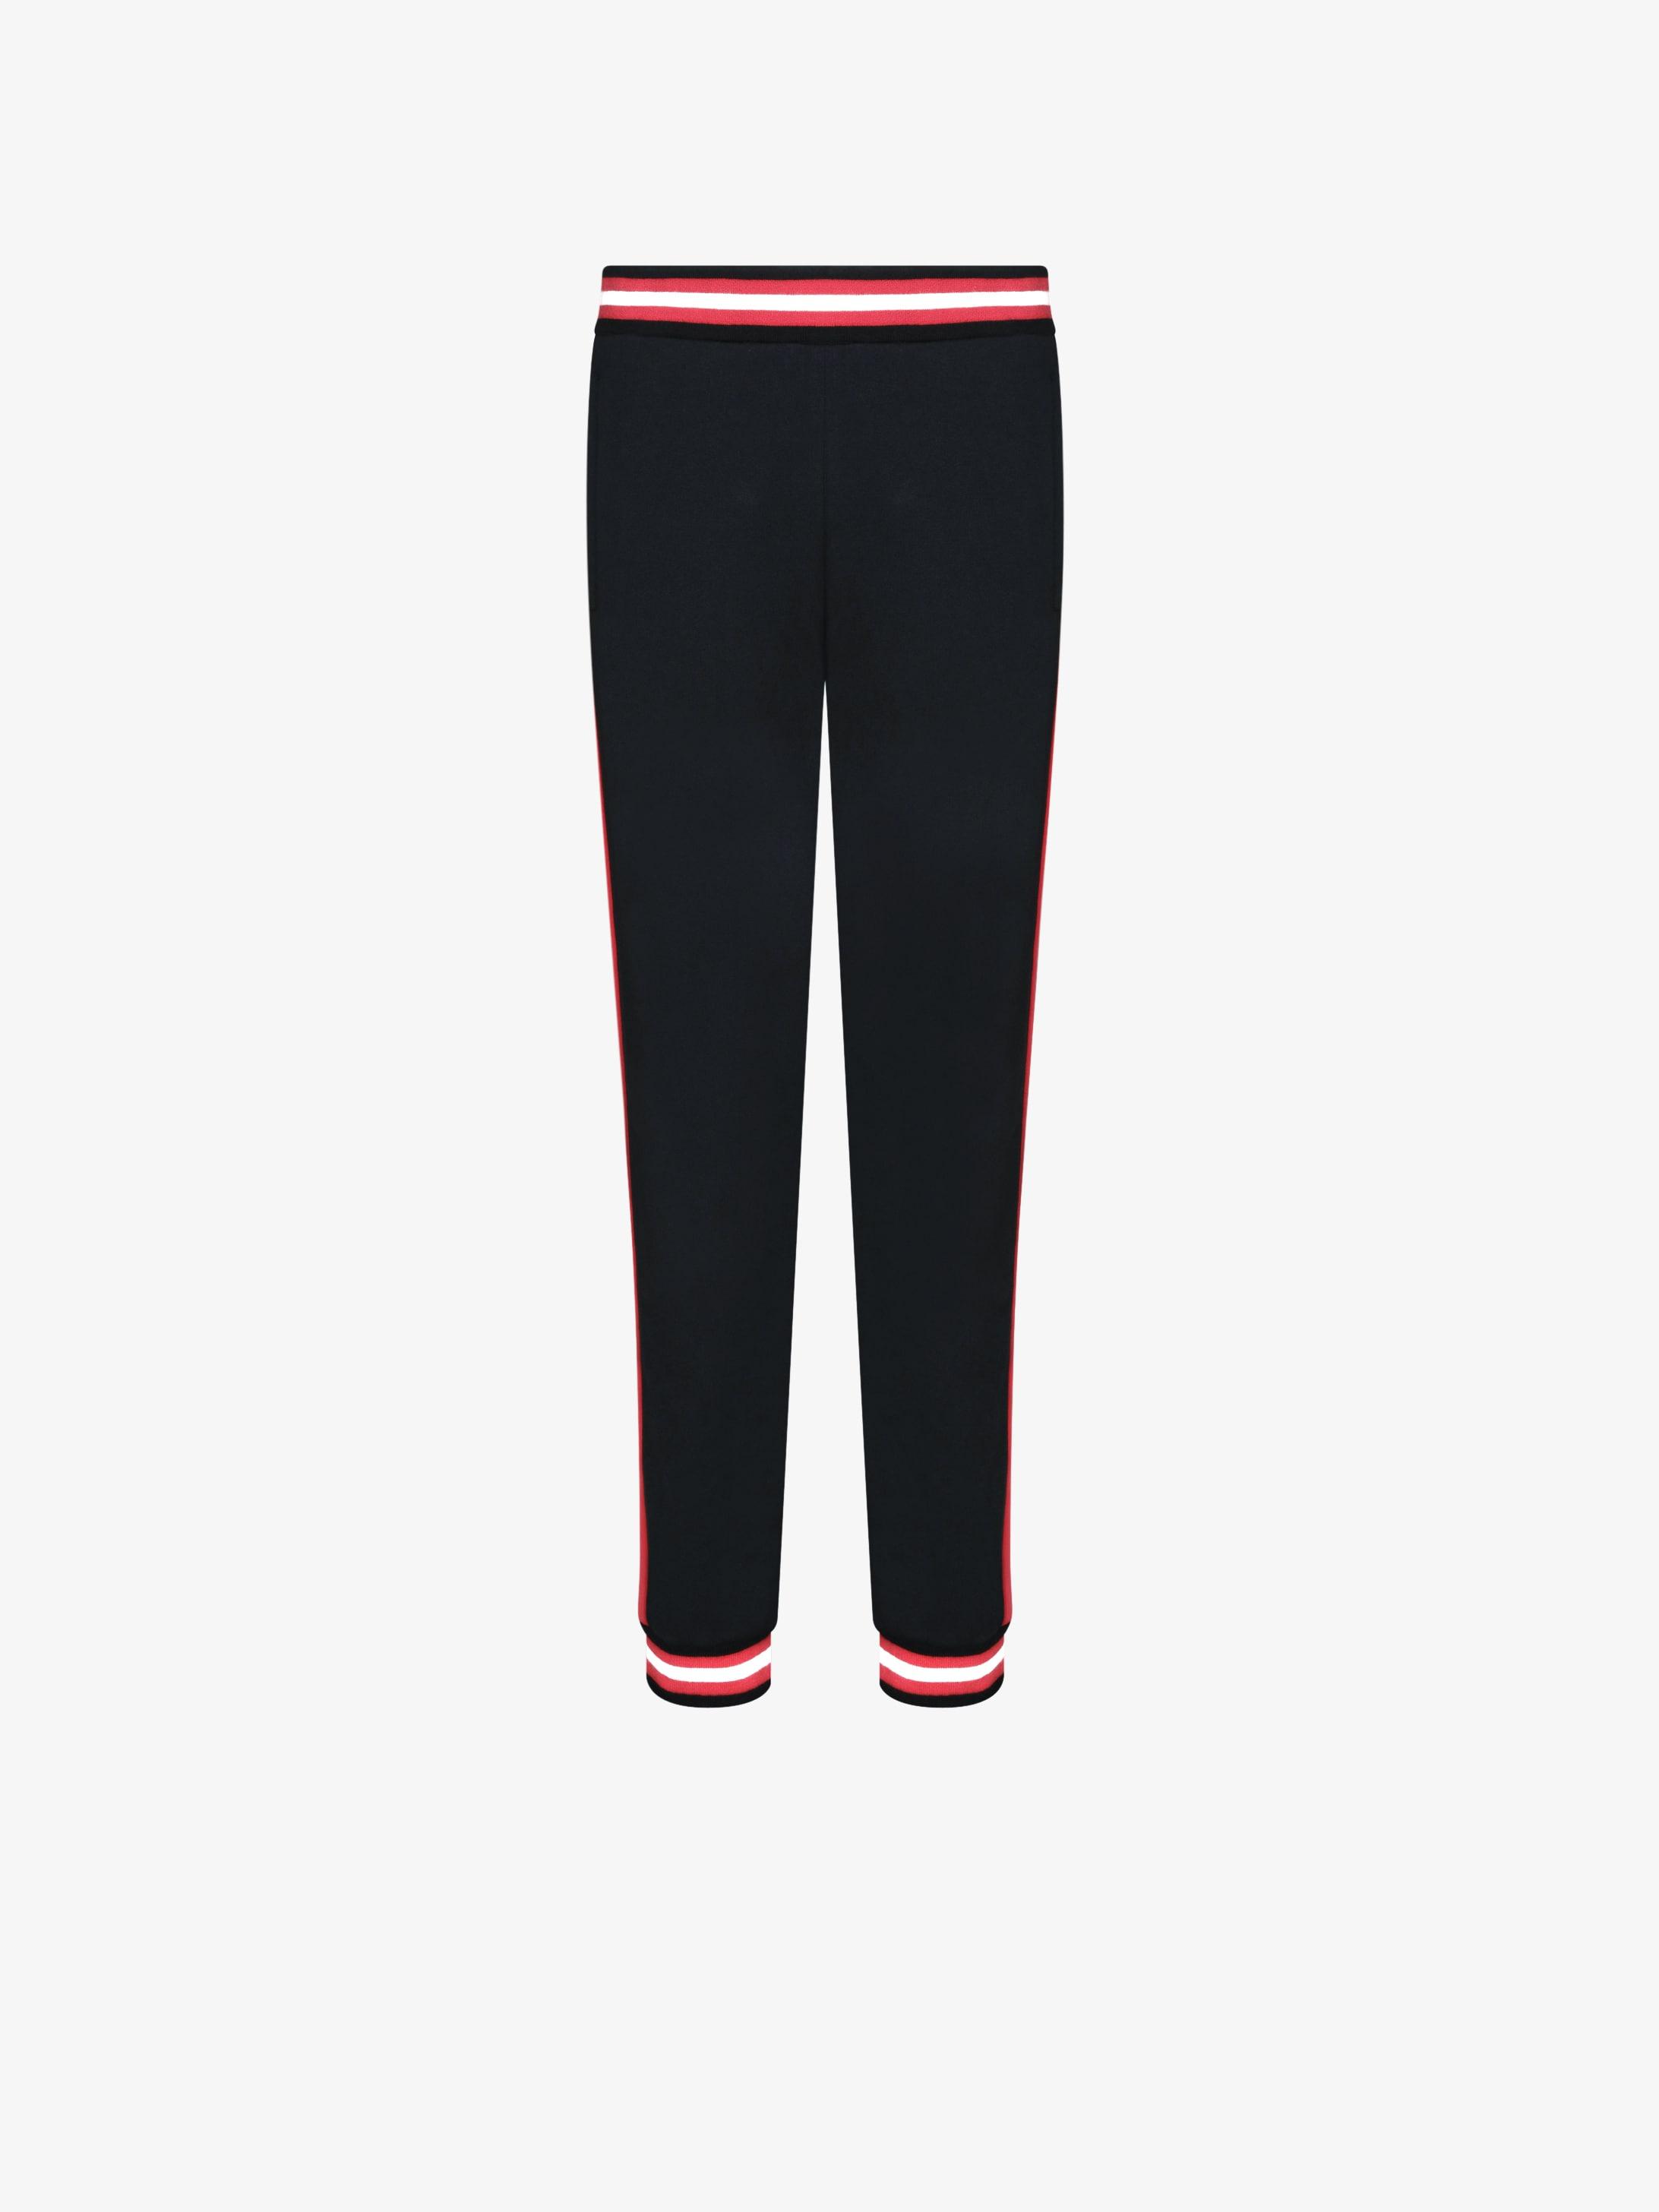 Contrasted bands felpa jogging pants